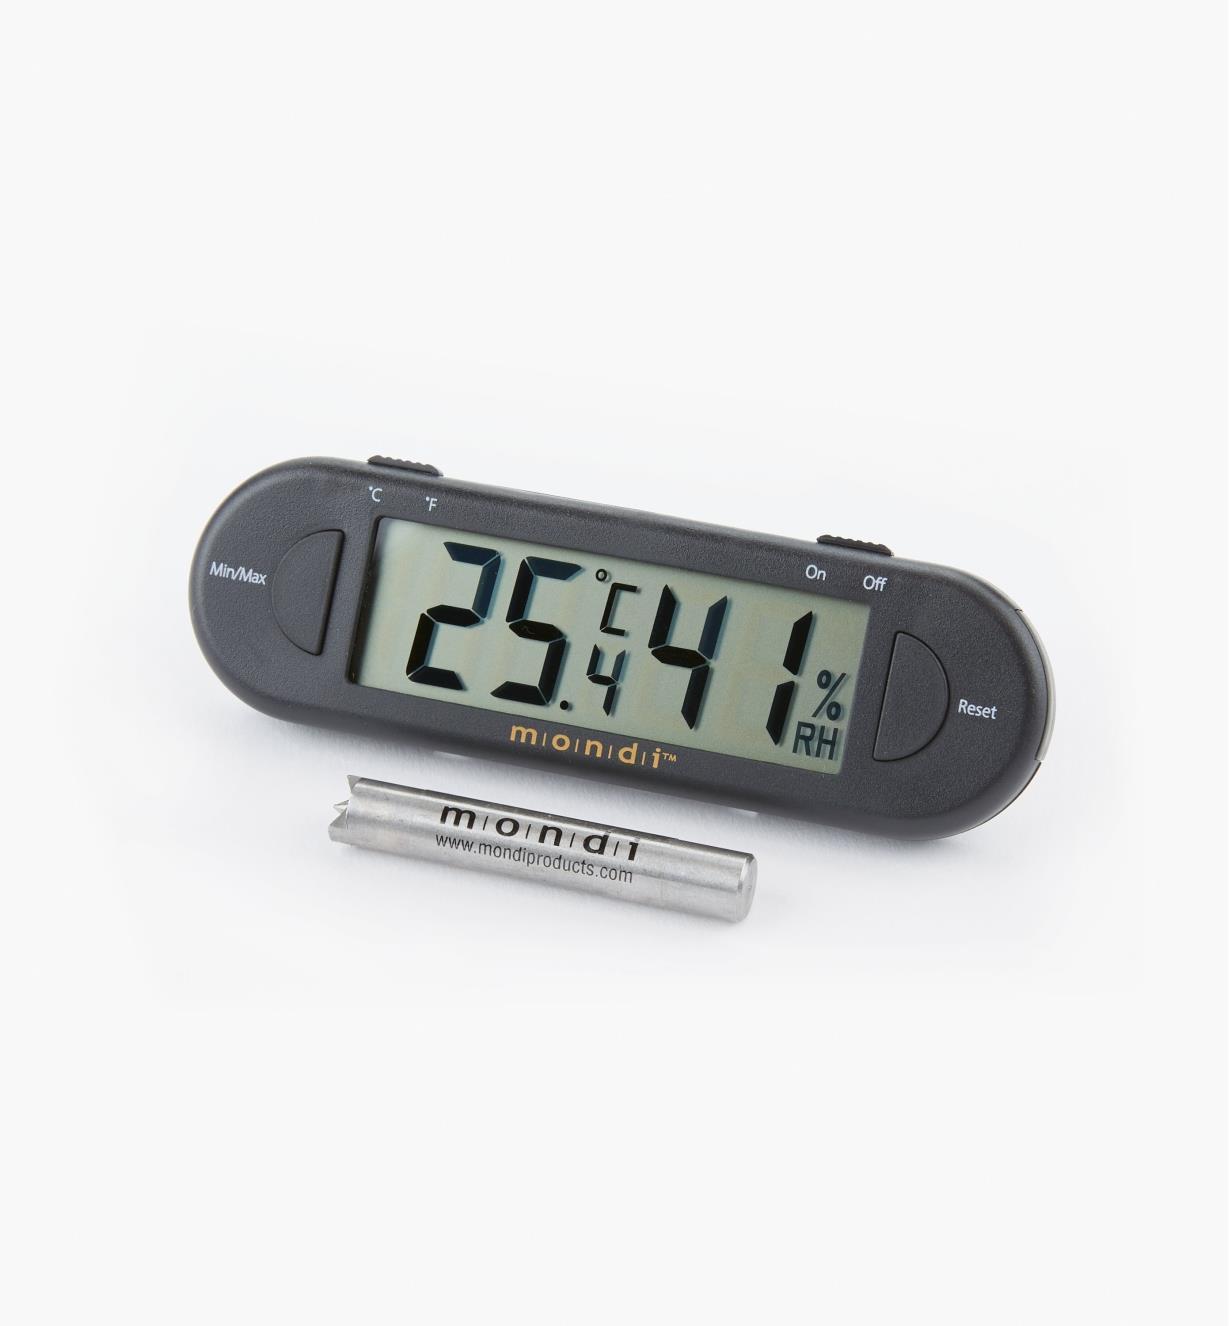 KD336 - Thermohygromètre compact